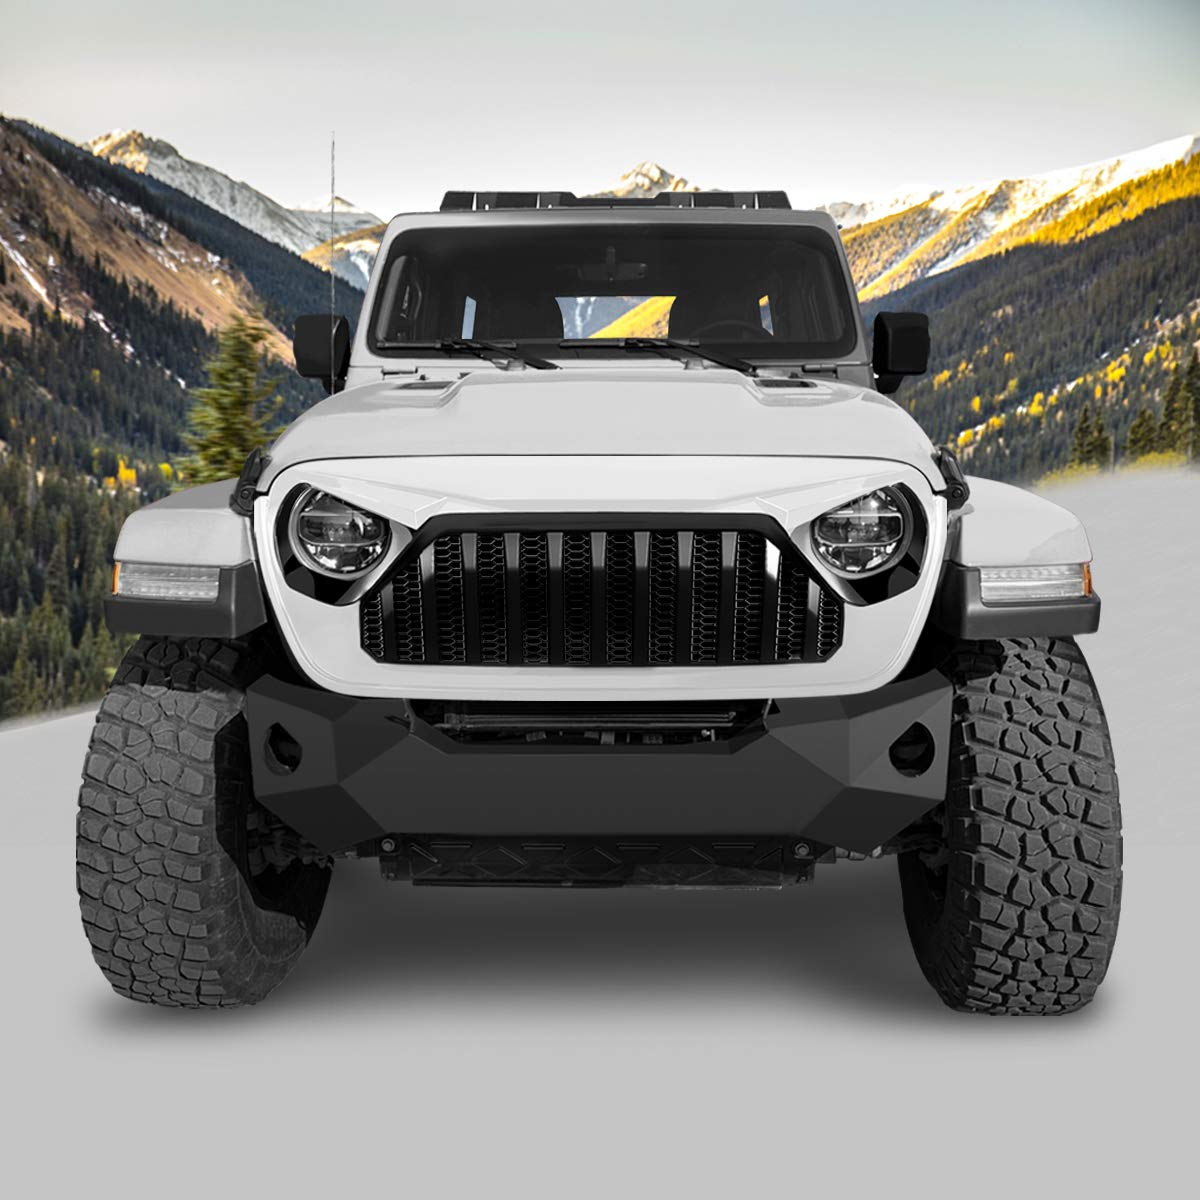 American 4wheel White /& Black Gladiator Vader Grille Grill for Jeep Wrangler 2018-2019 JL JLU ABS